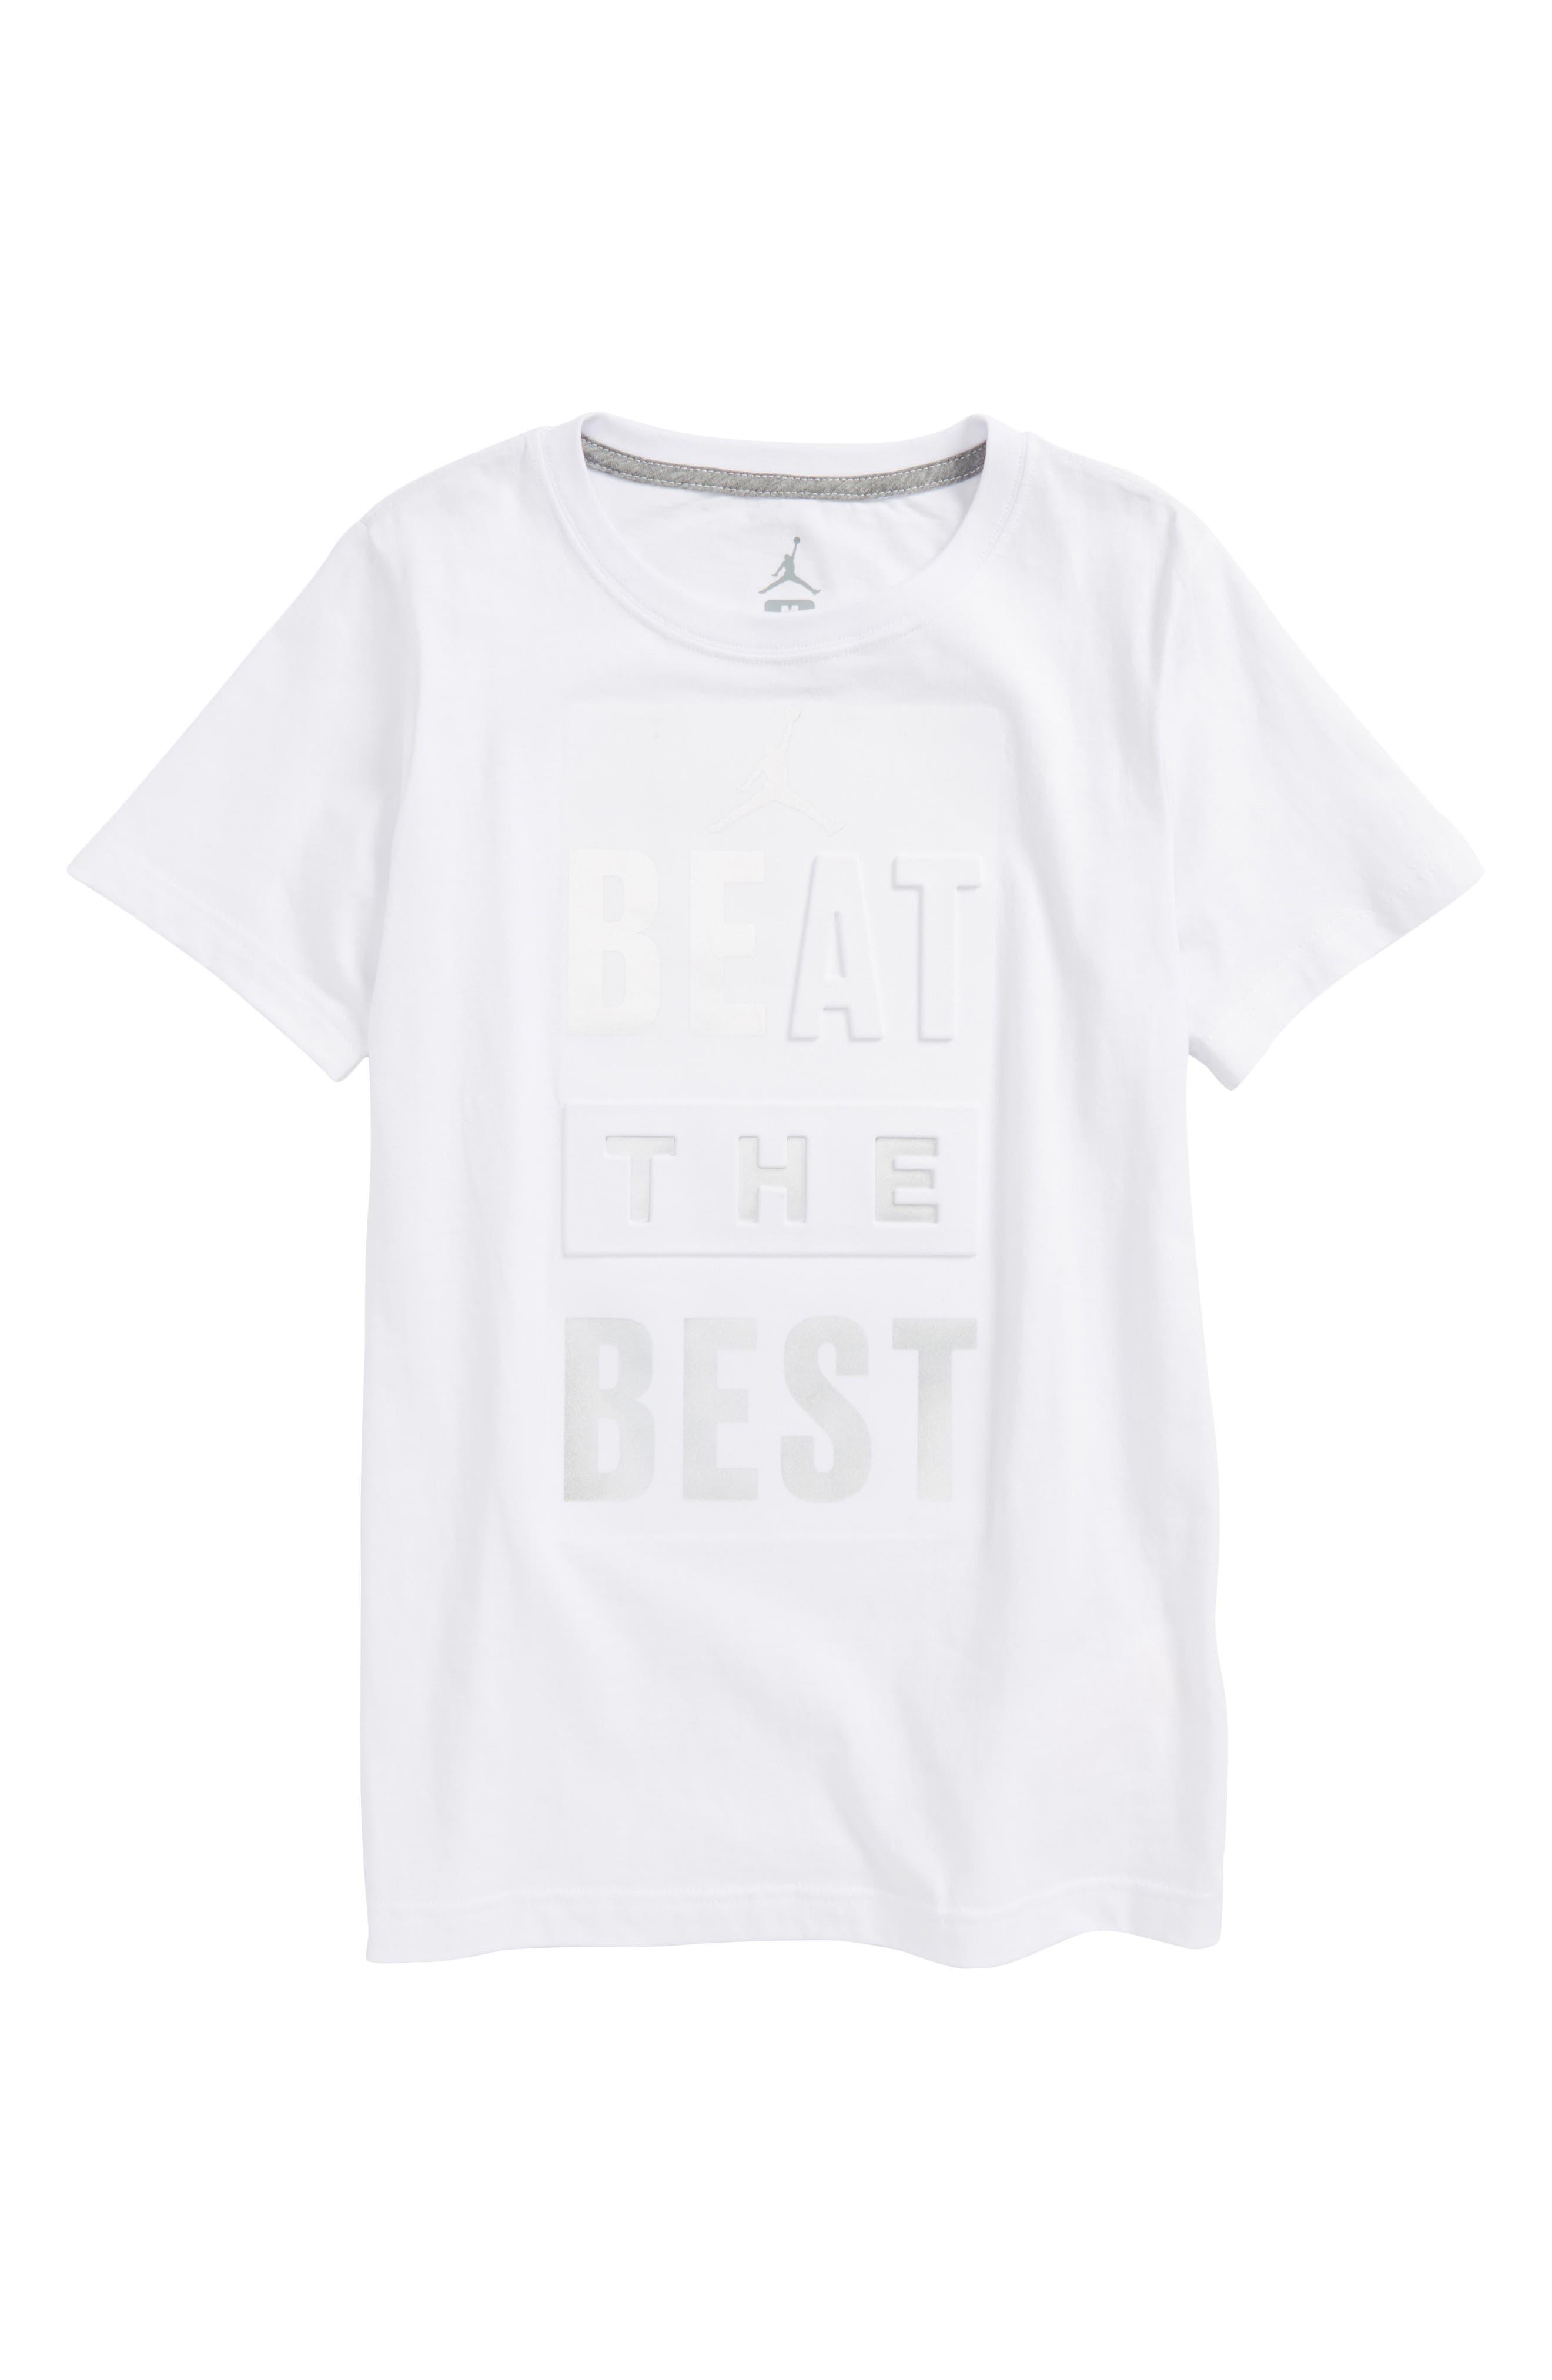 Jordan Beat the Best Graphic T-Shirt,                         Main,                         color, 100